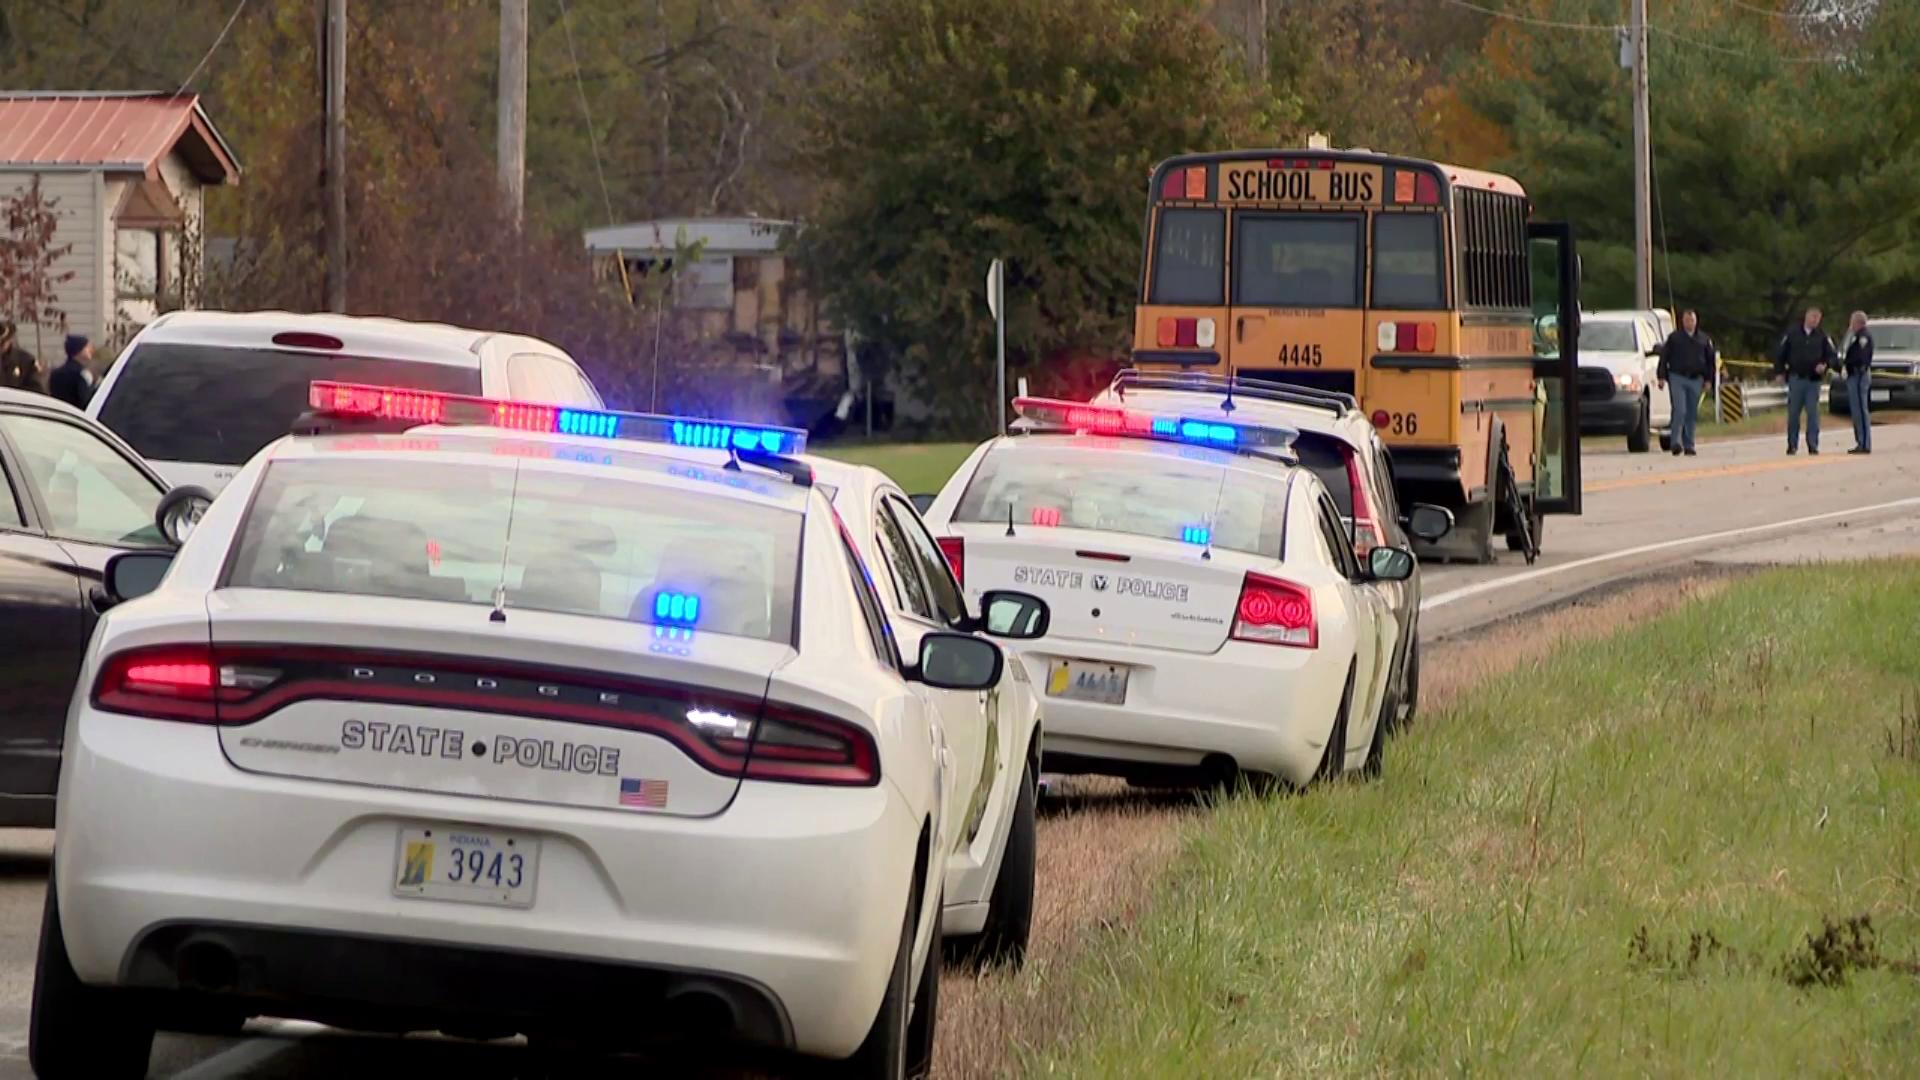 School bus stop crashes kill 5 in 3 days, amid